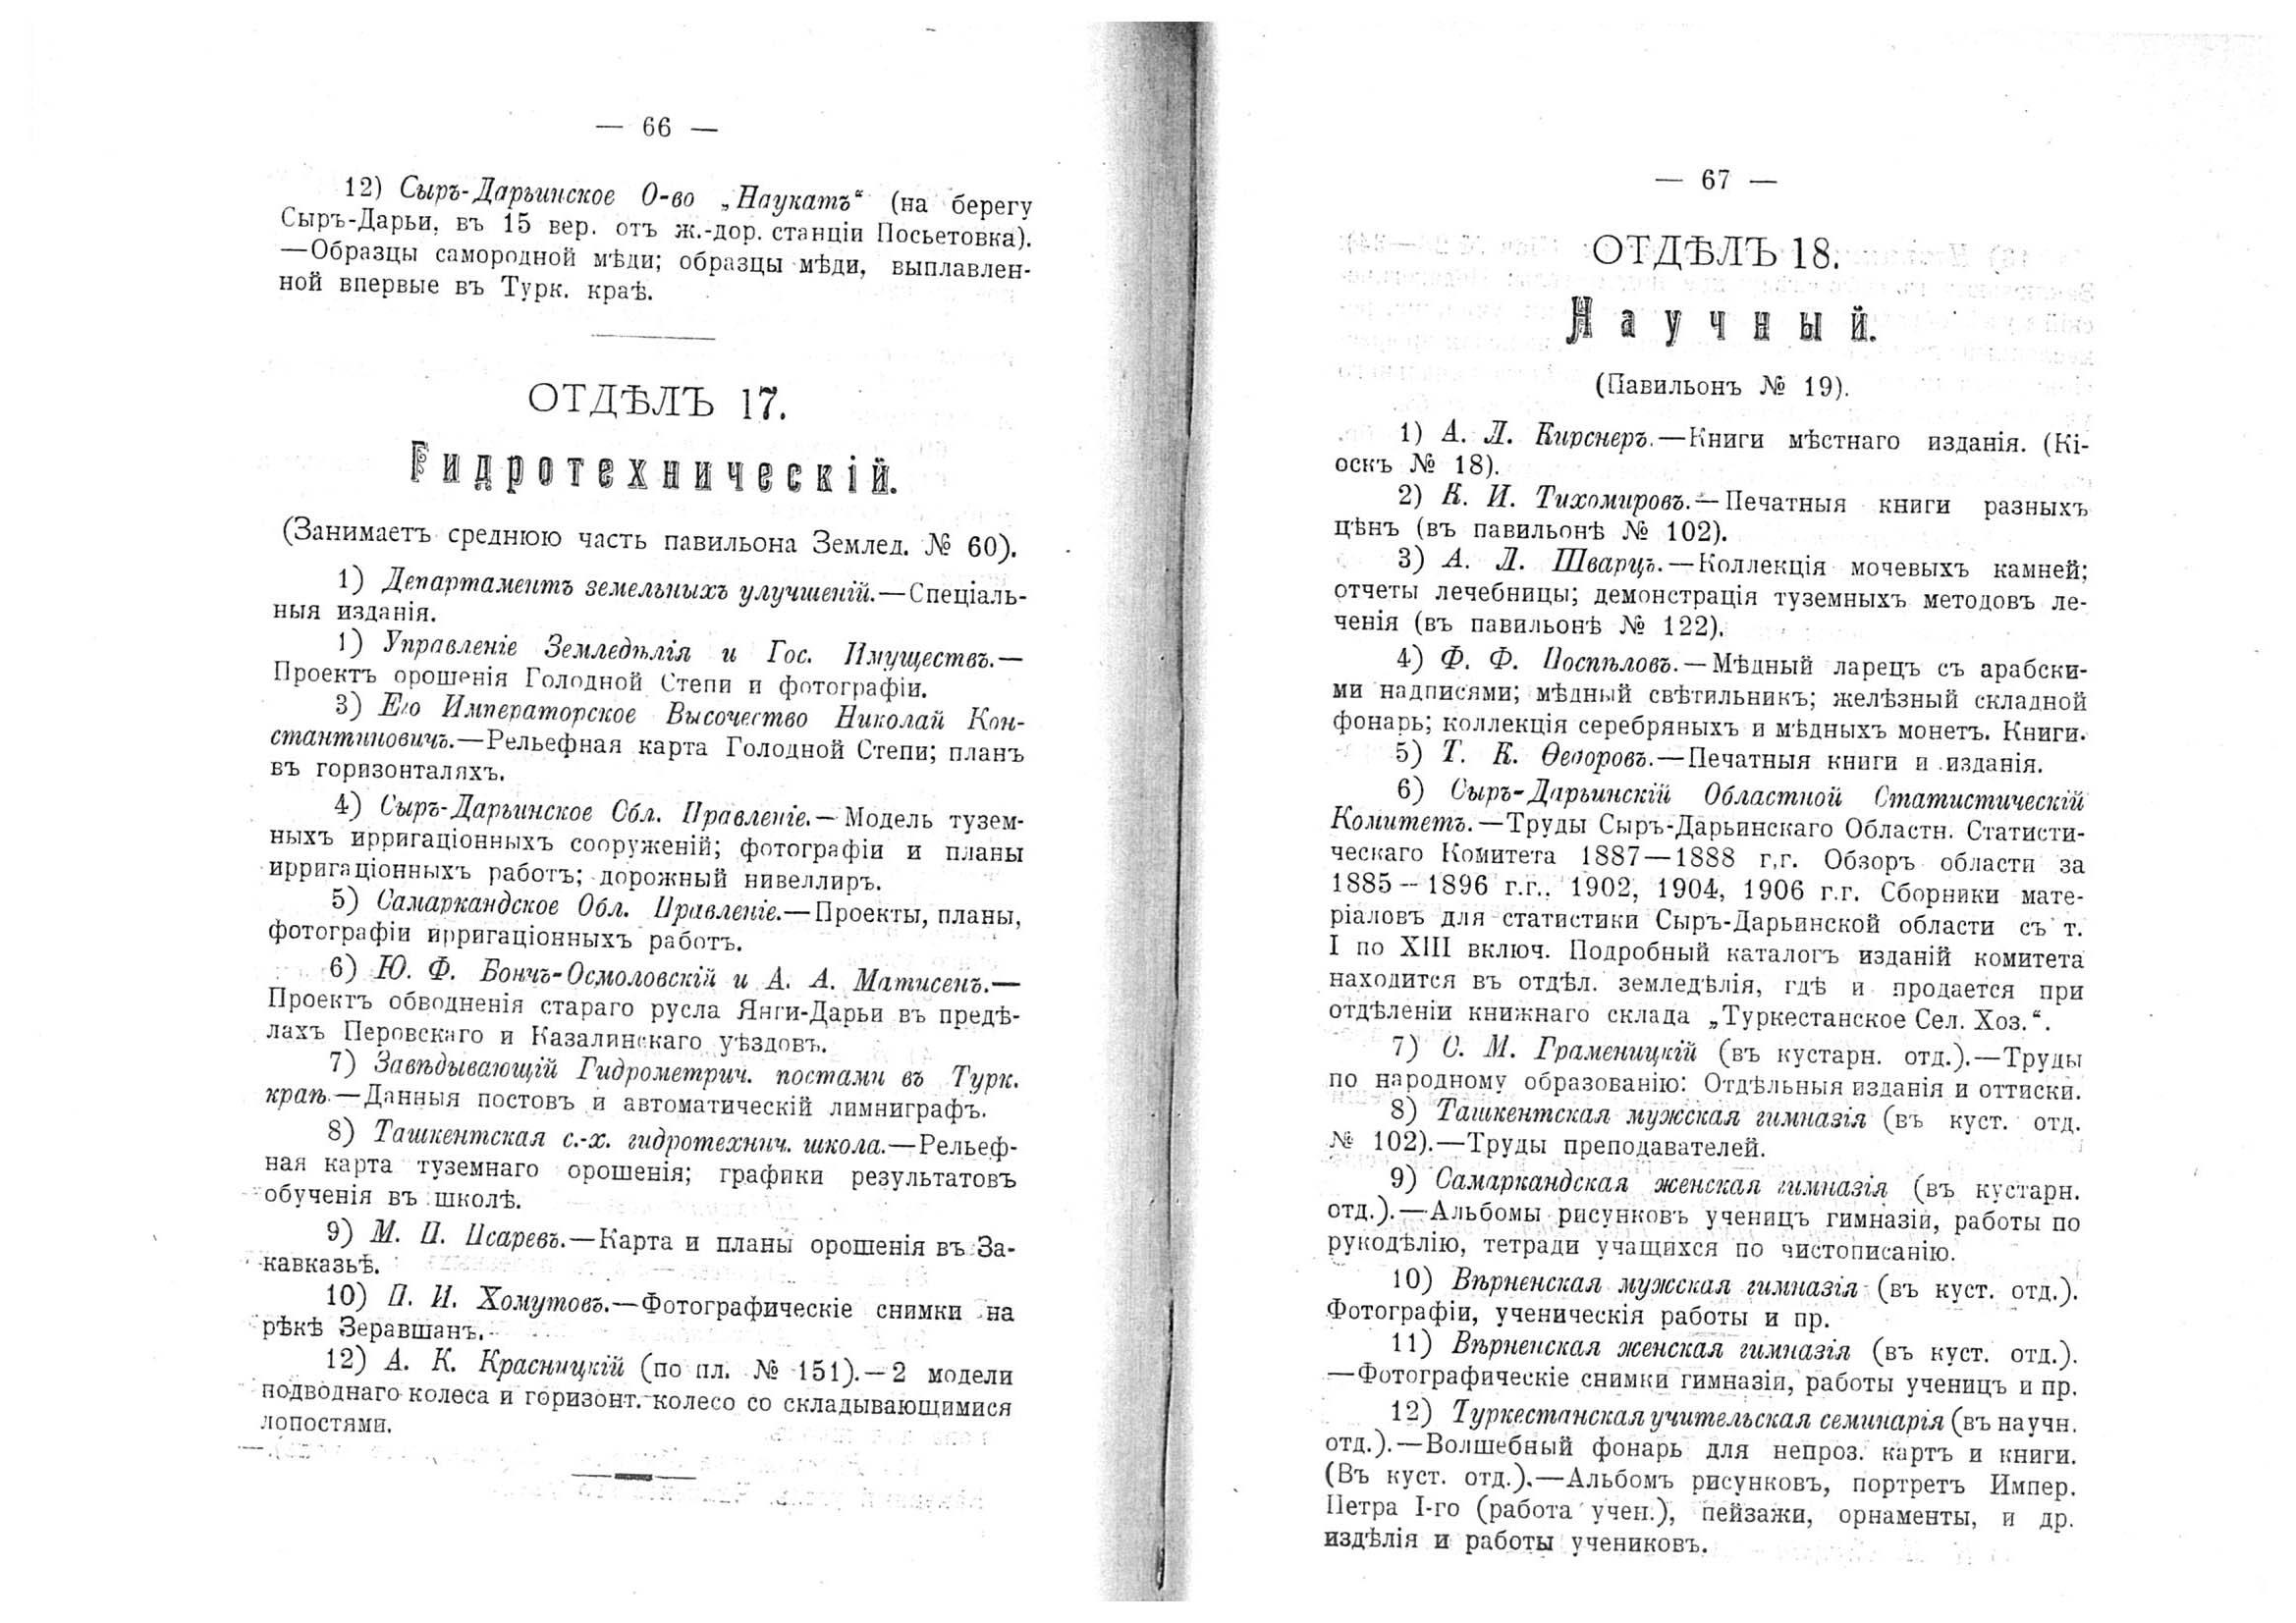 Katalog-Putevoditel 1909 - 080